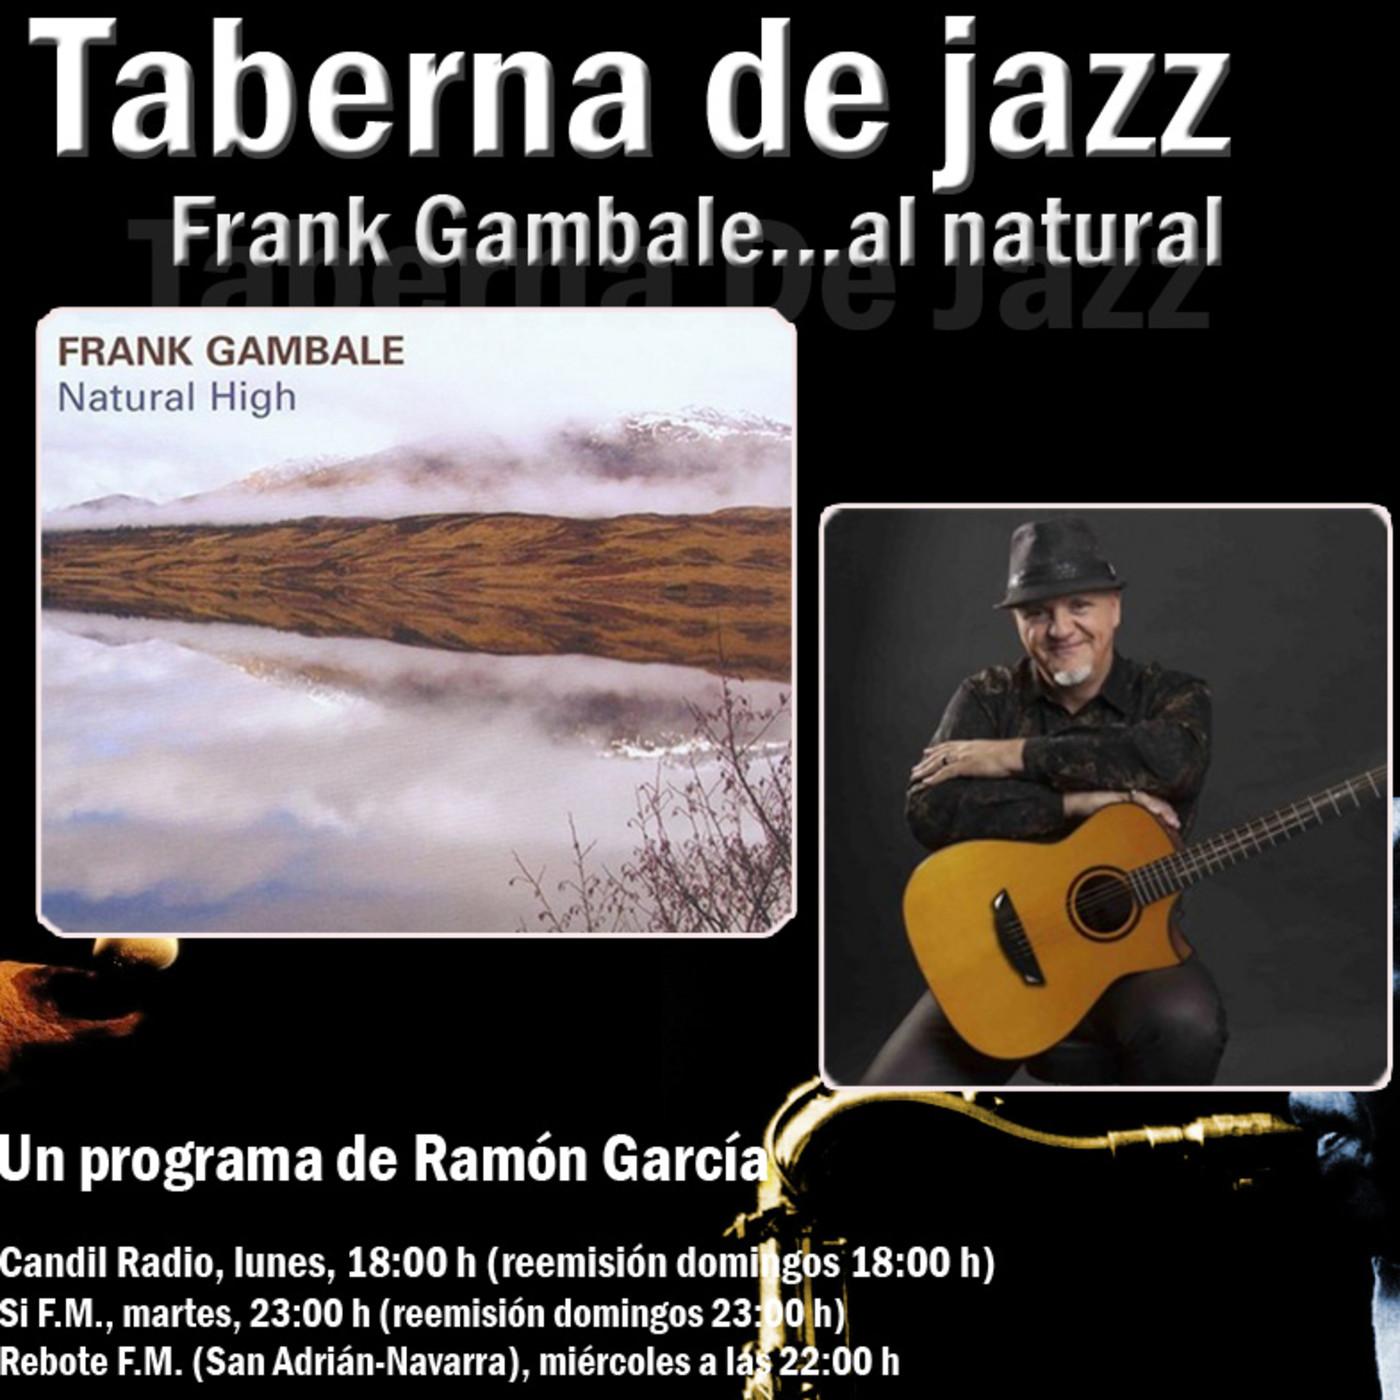 Taberna de JAZZ - 5x33 - Frank Gambale al natural